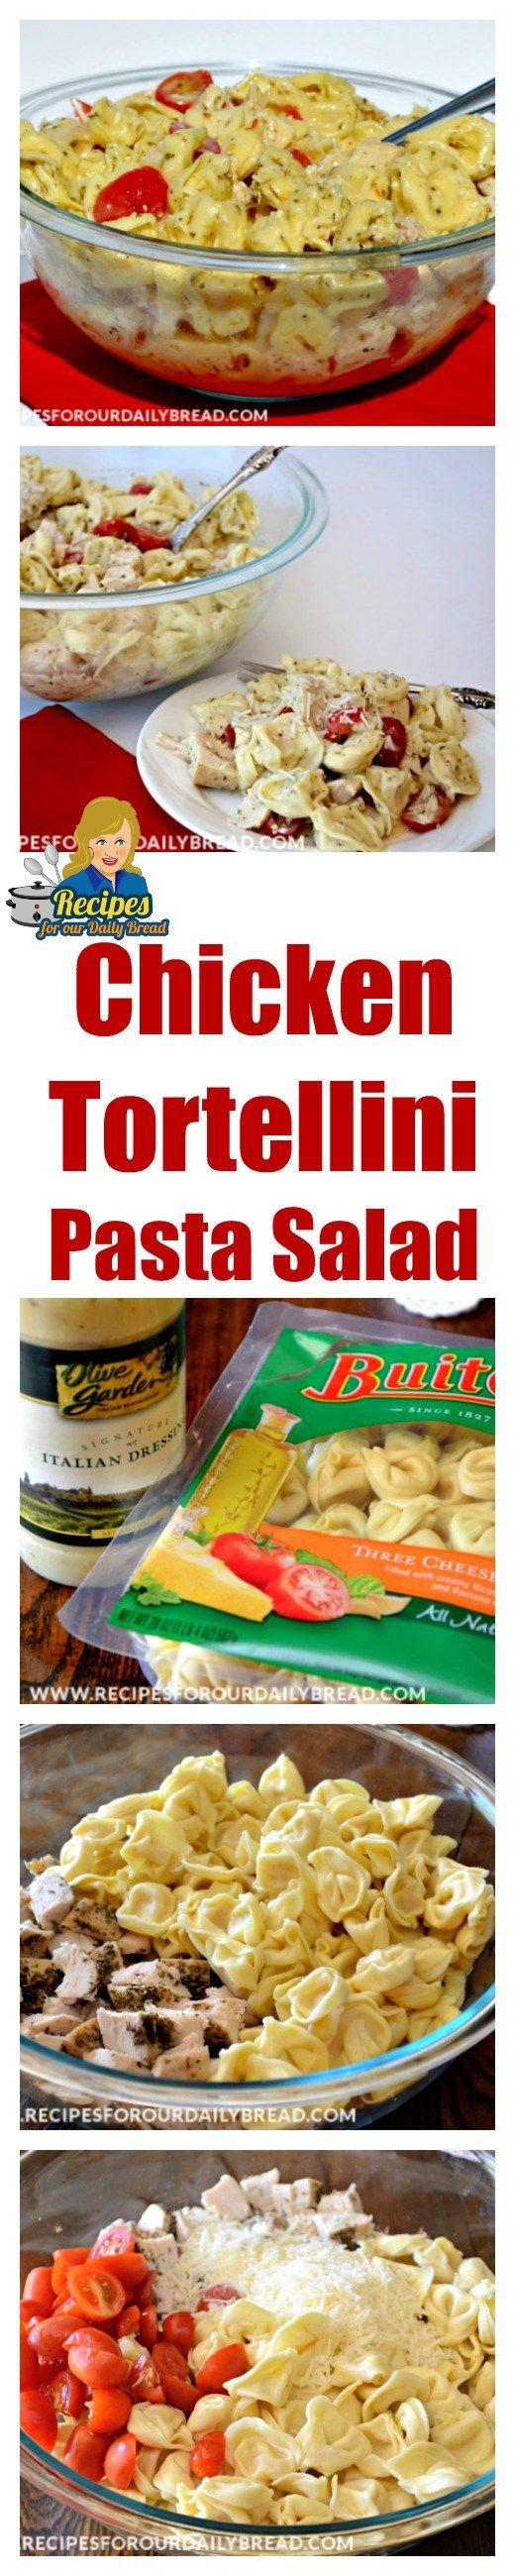 Chicken Tortellini Pasta Salad includes chicken, Tortellini, garlic, Italian seasoning, tomatoes, cucumbers and Italian cheese.